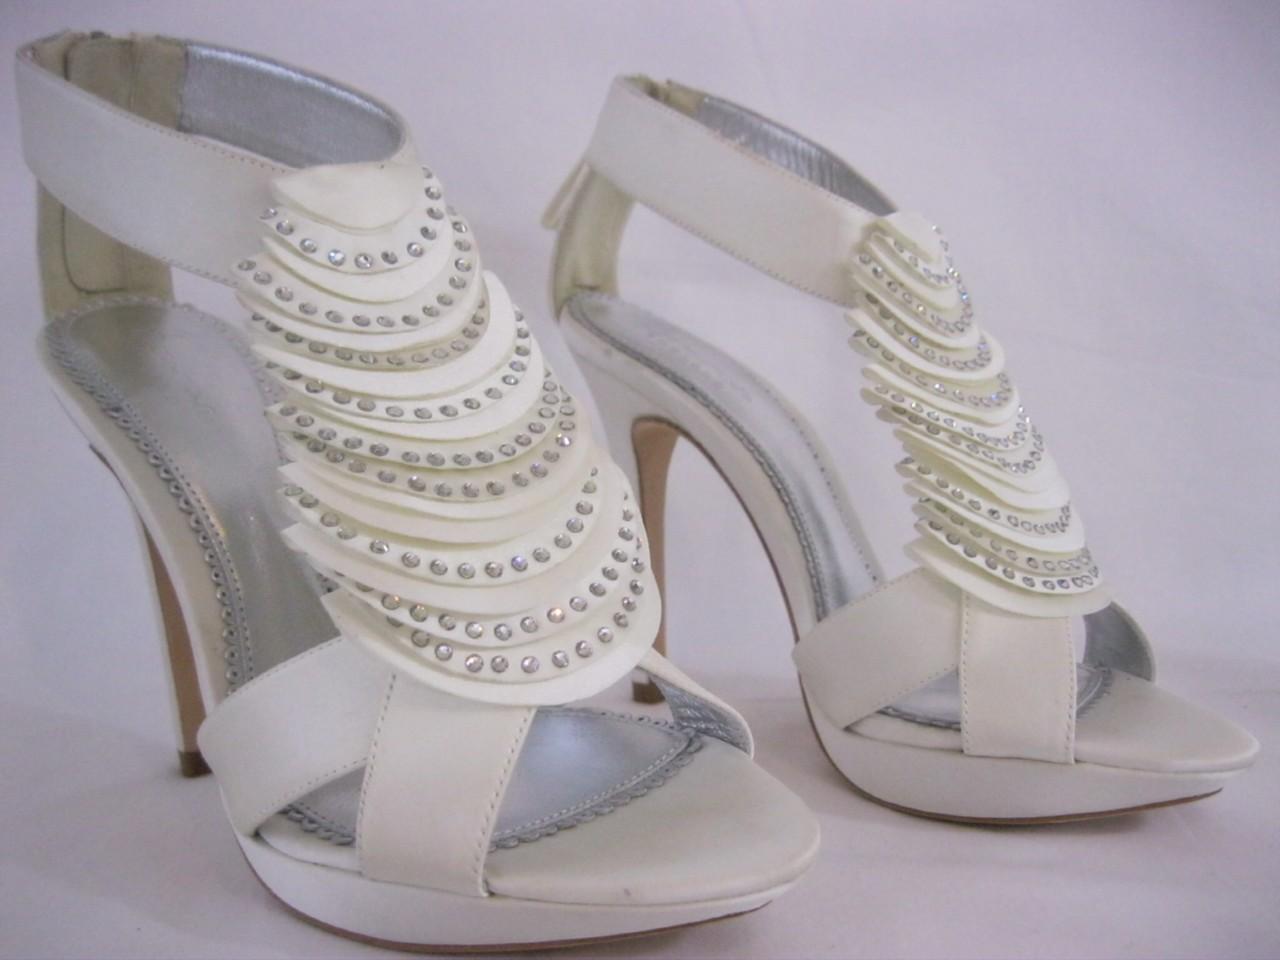 Bourne Ivory Georgia GBP151 Bridal Shoe Diamante Cristal Encrusted Petal T Bar 3 8